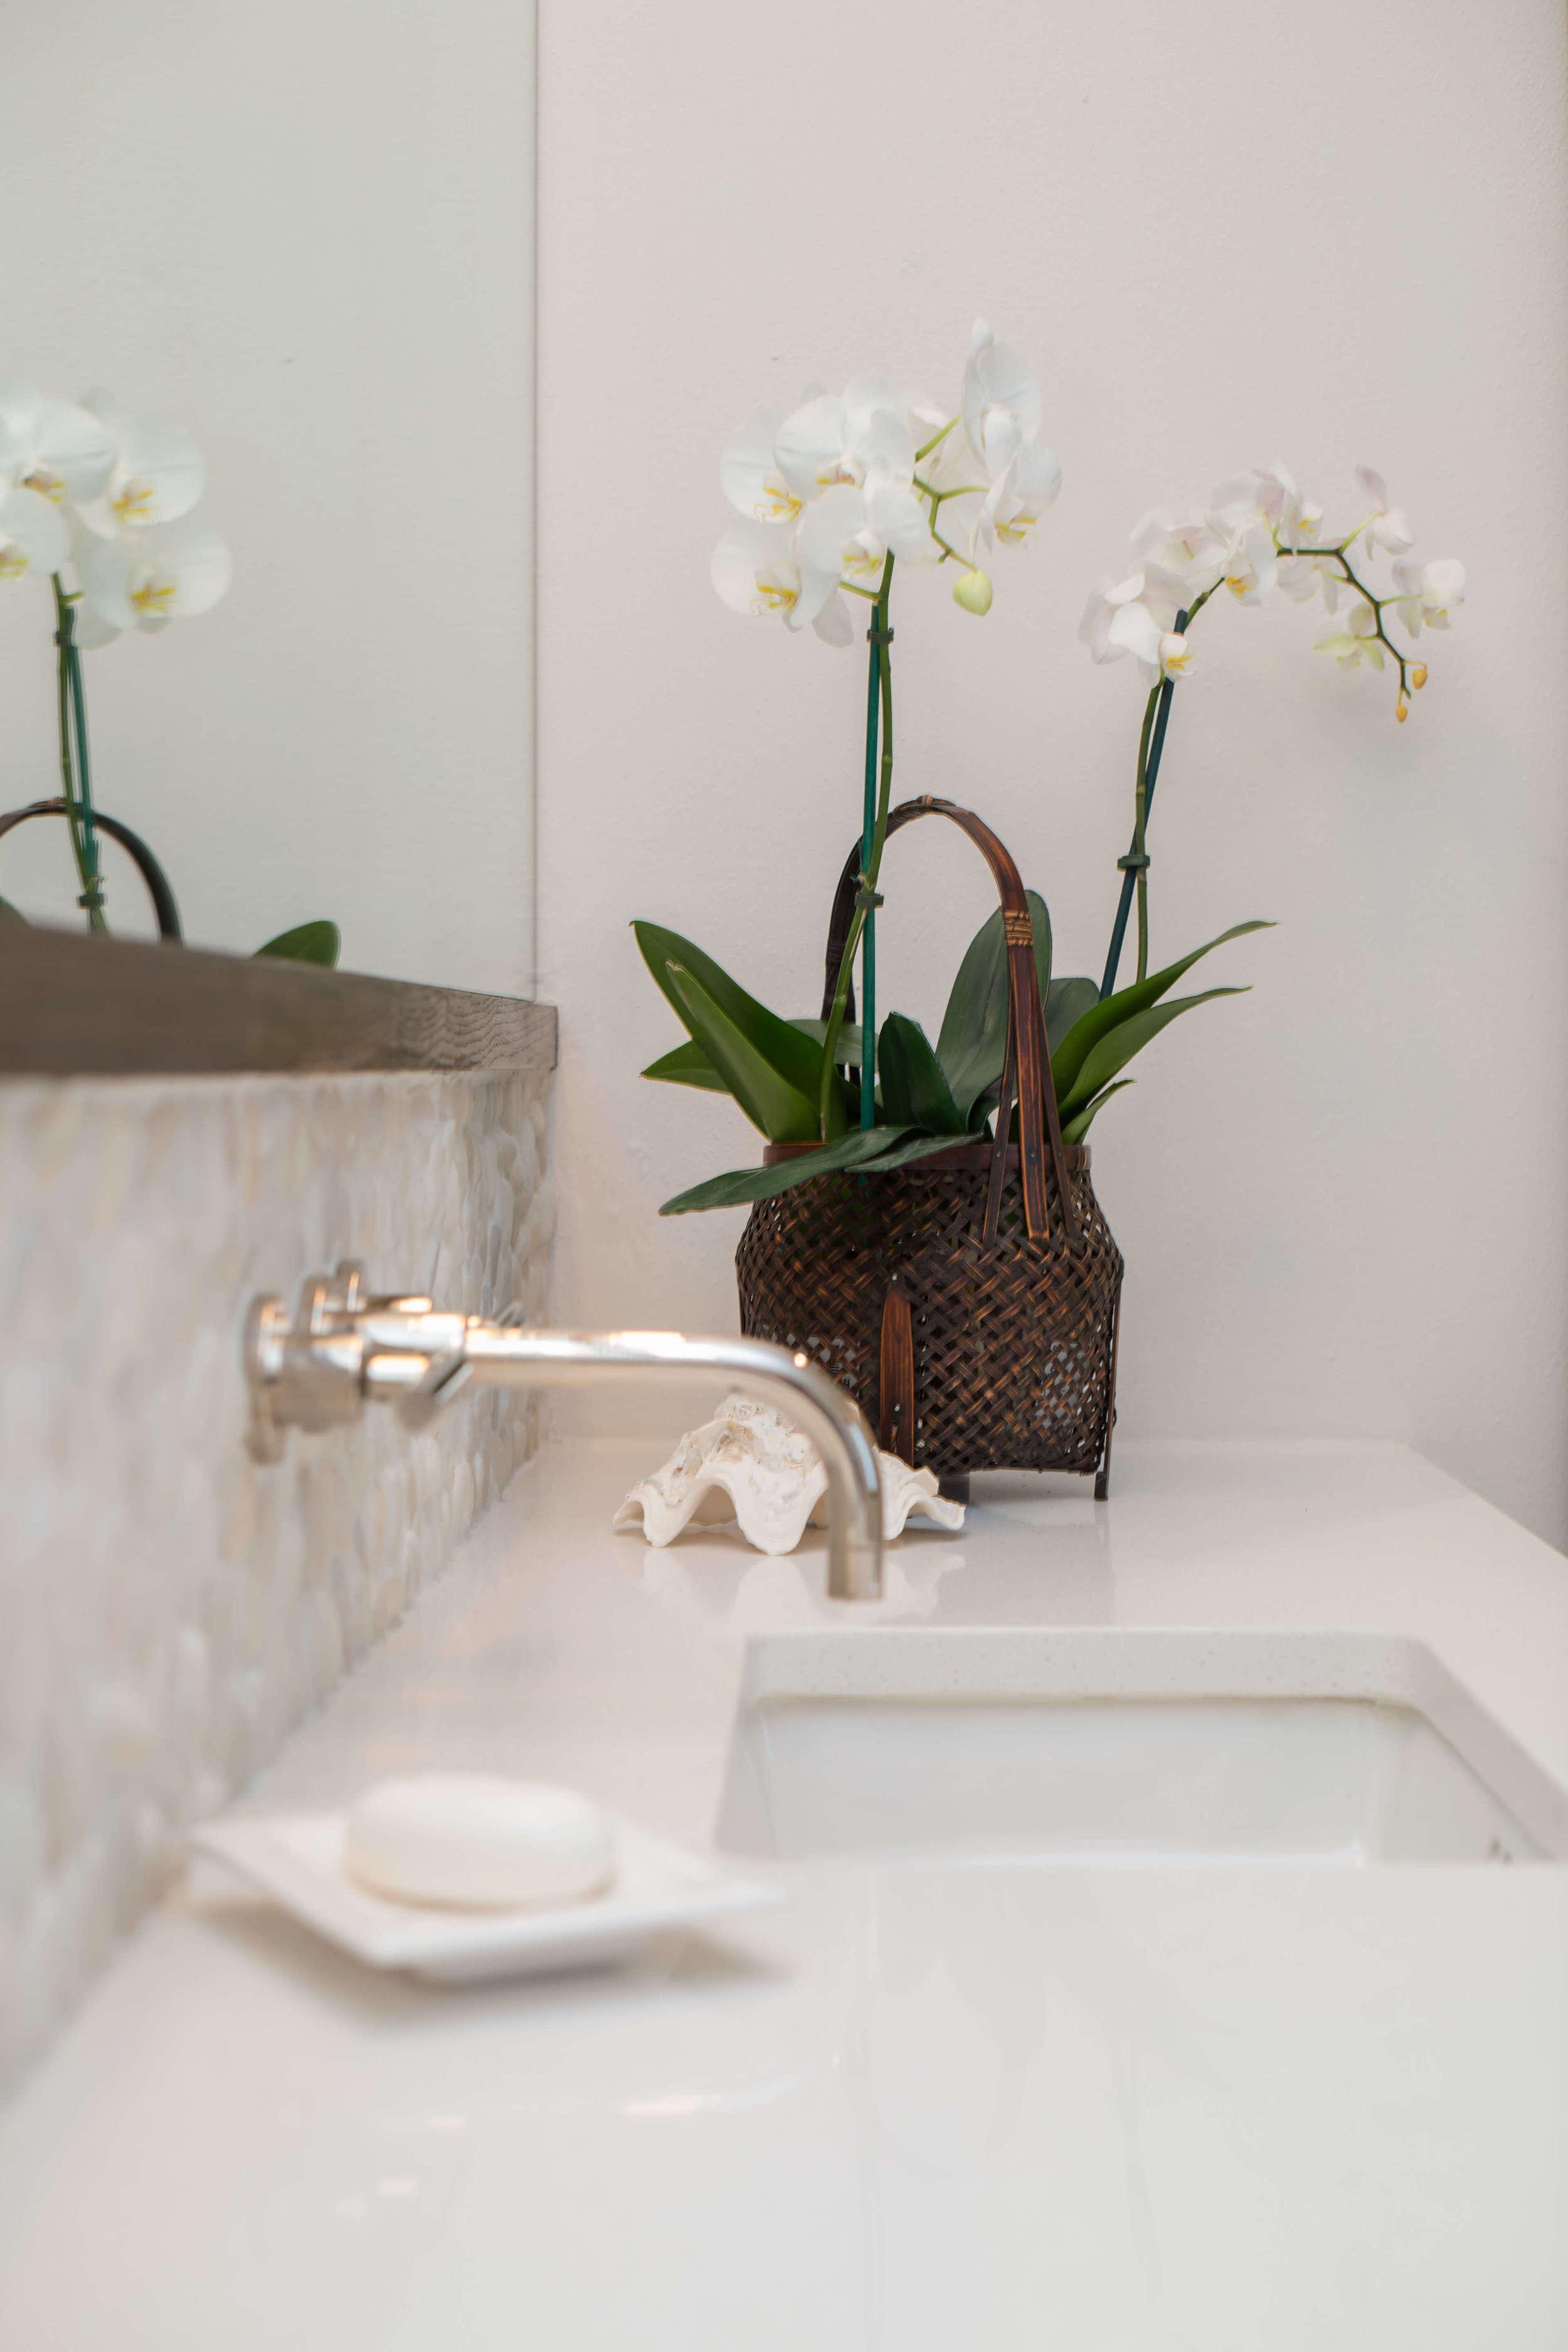 Master Bath Remodel - wall mount faucets, pebble tile backsplash